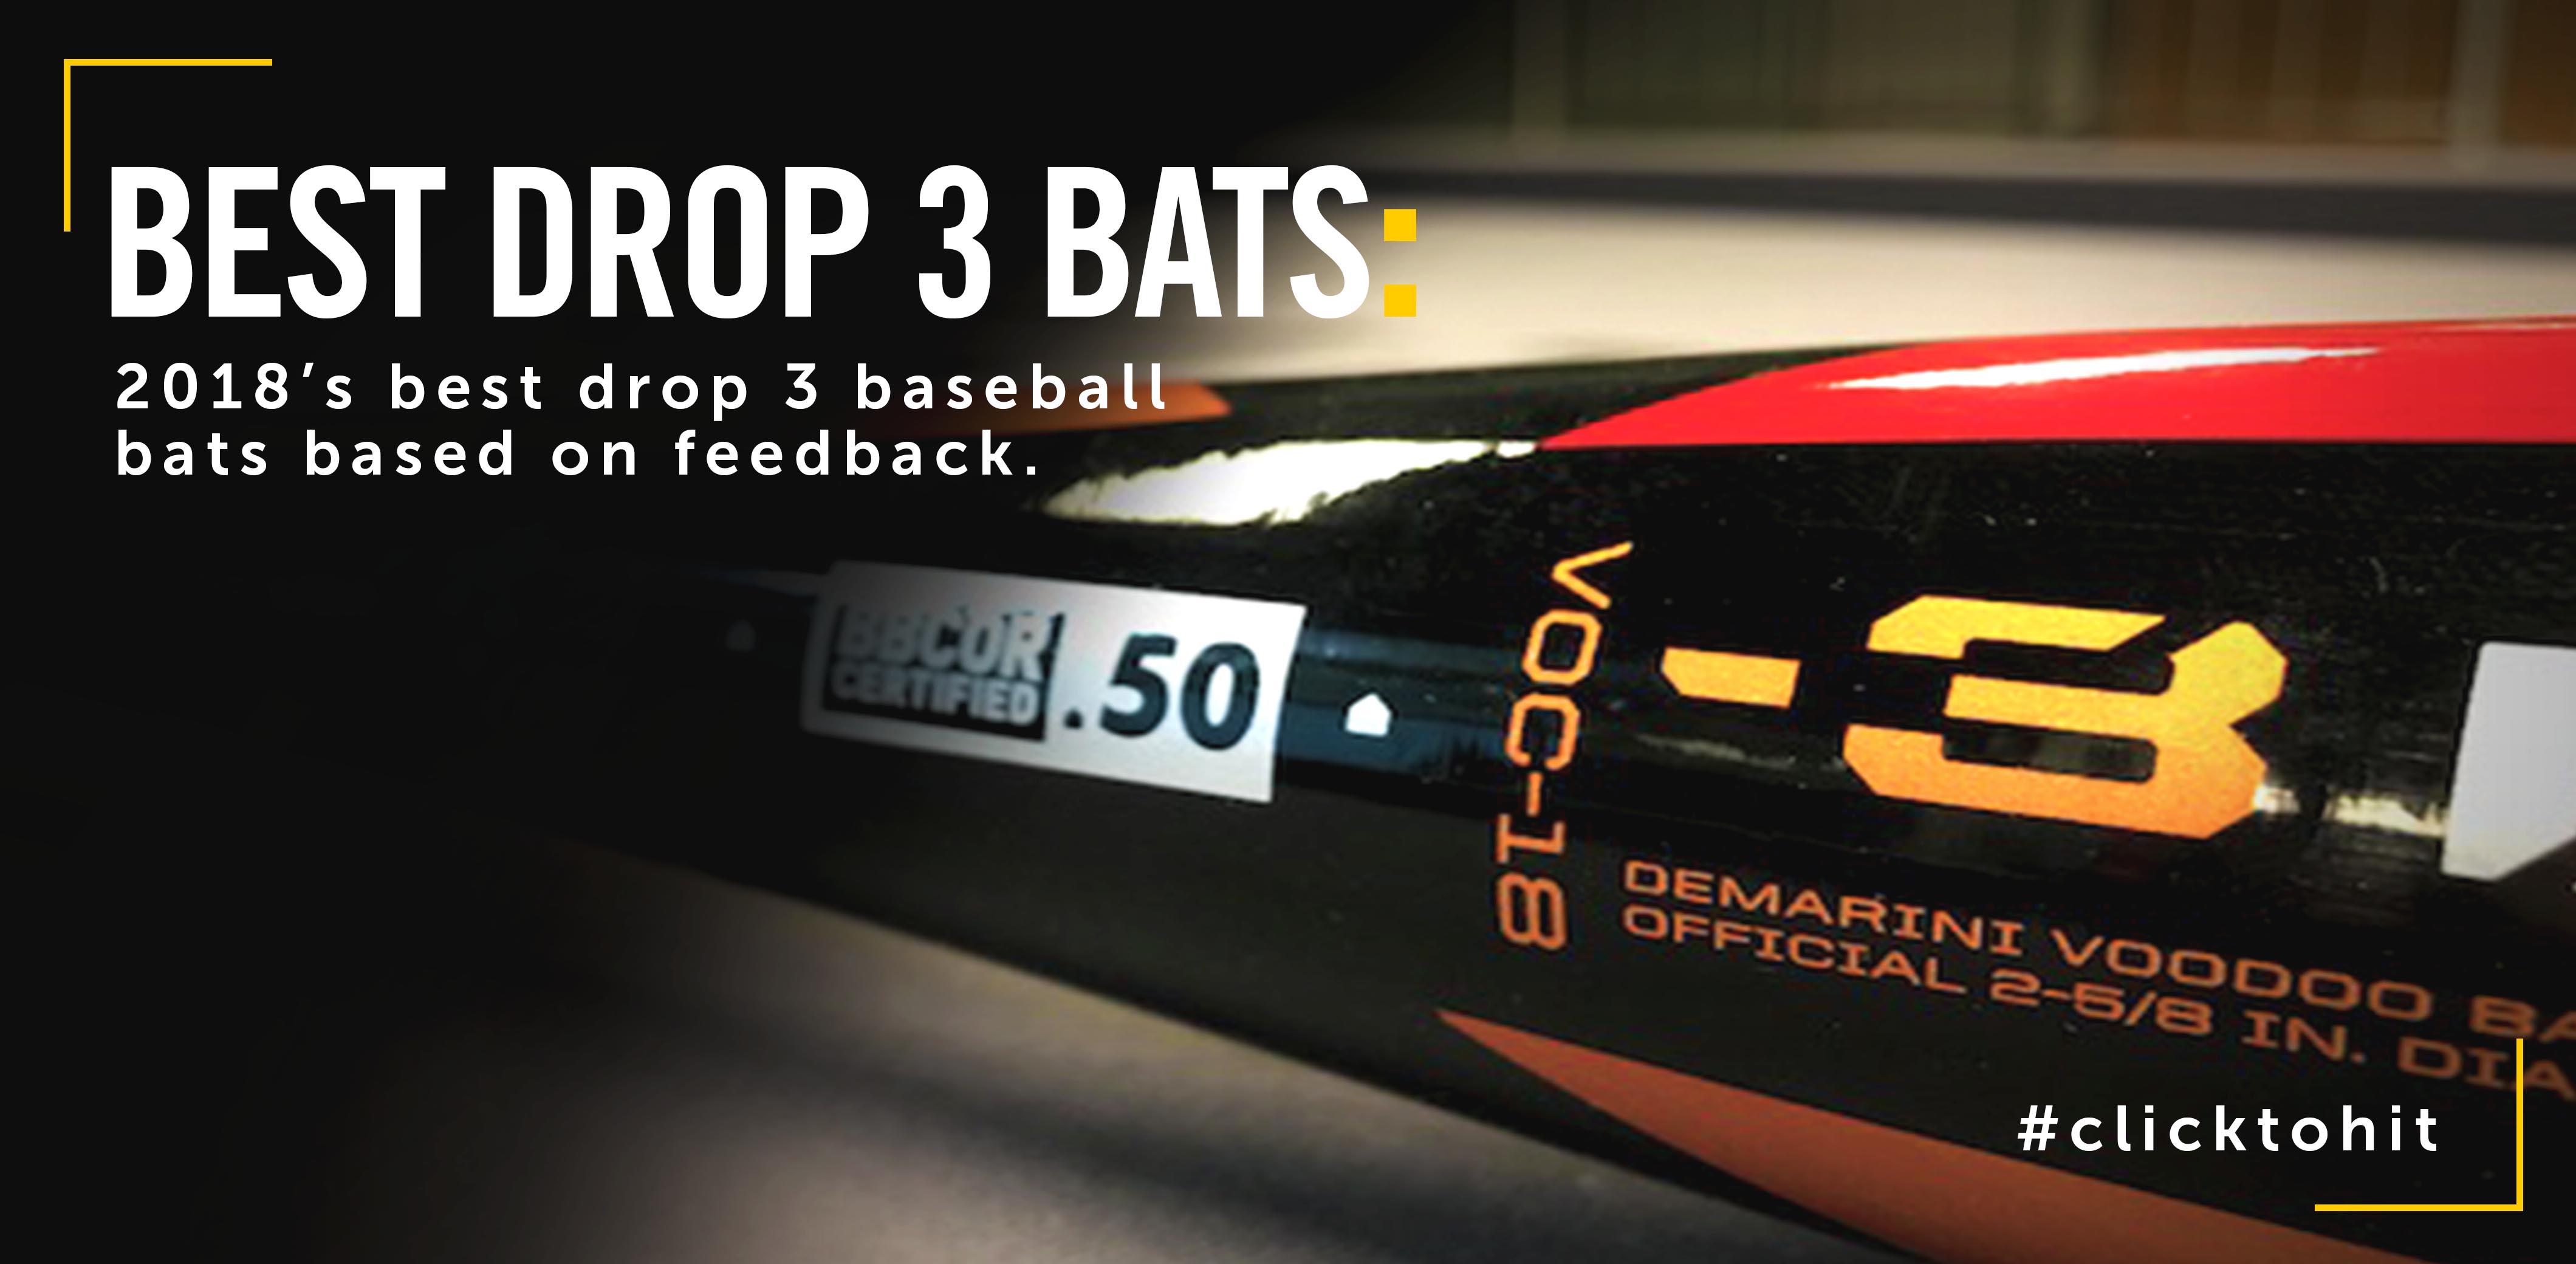 Best 2018 Drop 3 Bats